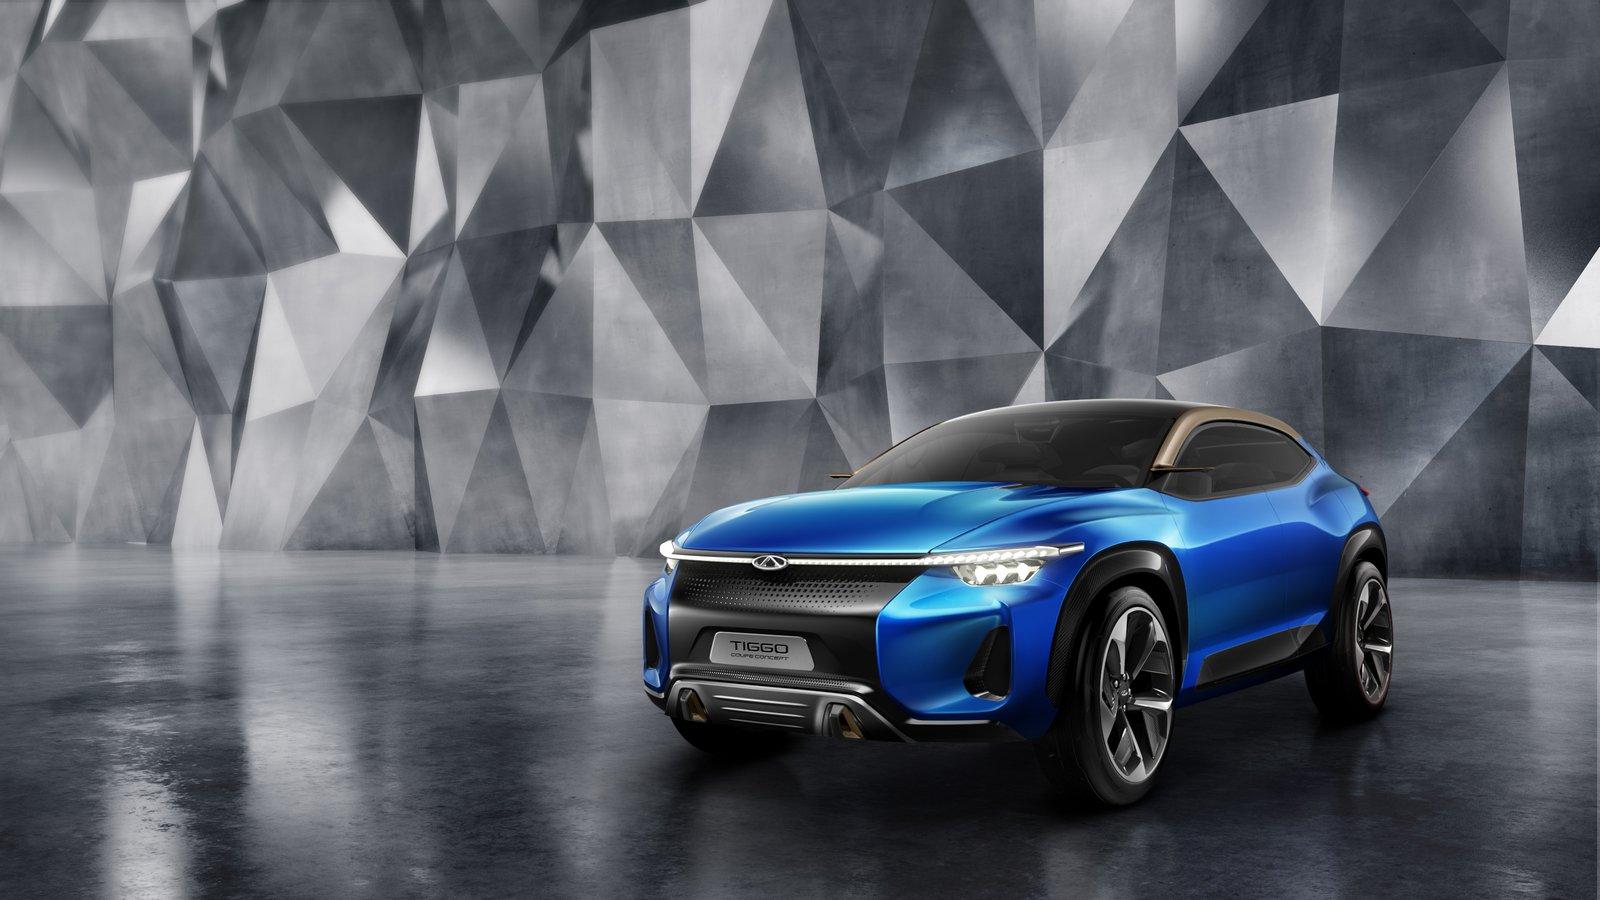 Chery-Tiggo-Sport-Coupe-Concept-2